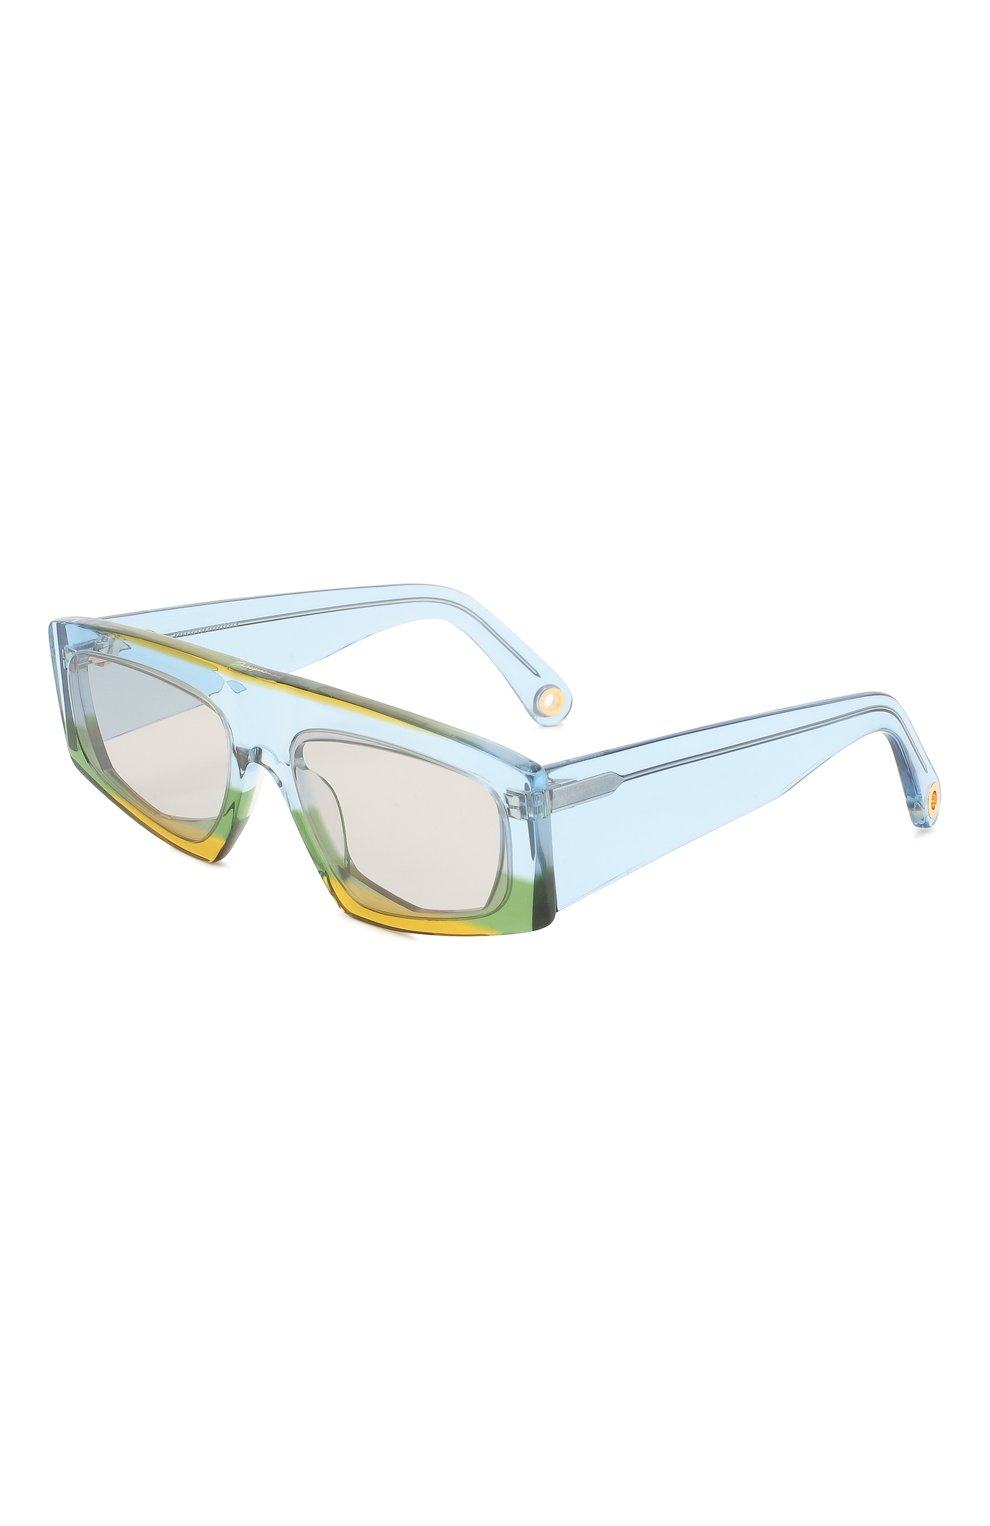 Женские солнцезащитные очки JACQUEMUS голубого цвета, арт. LES LUNETTES YAUC0 MULTI YELL0W | Фото 1